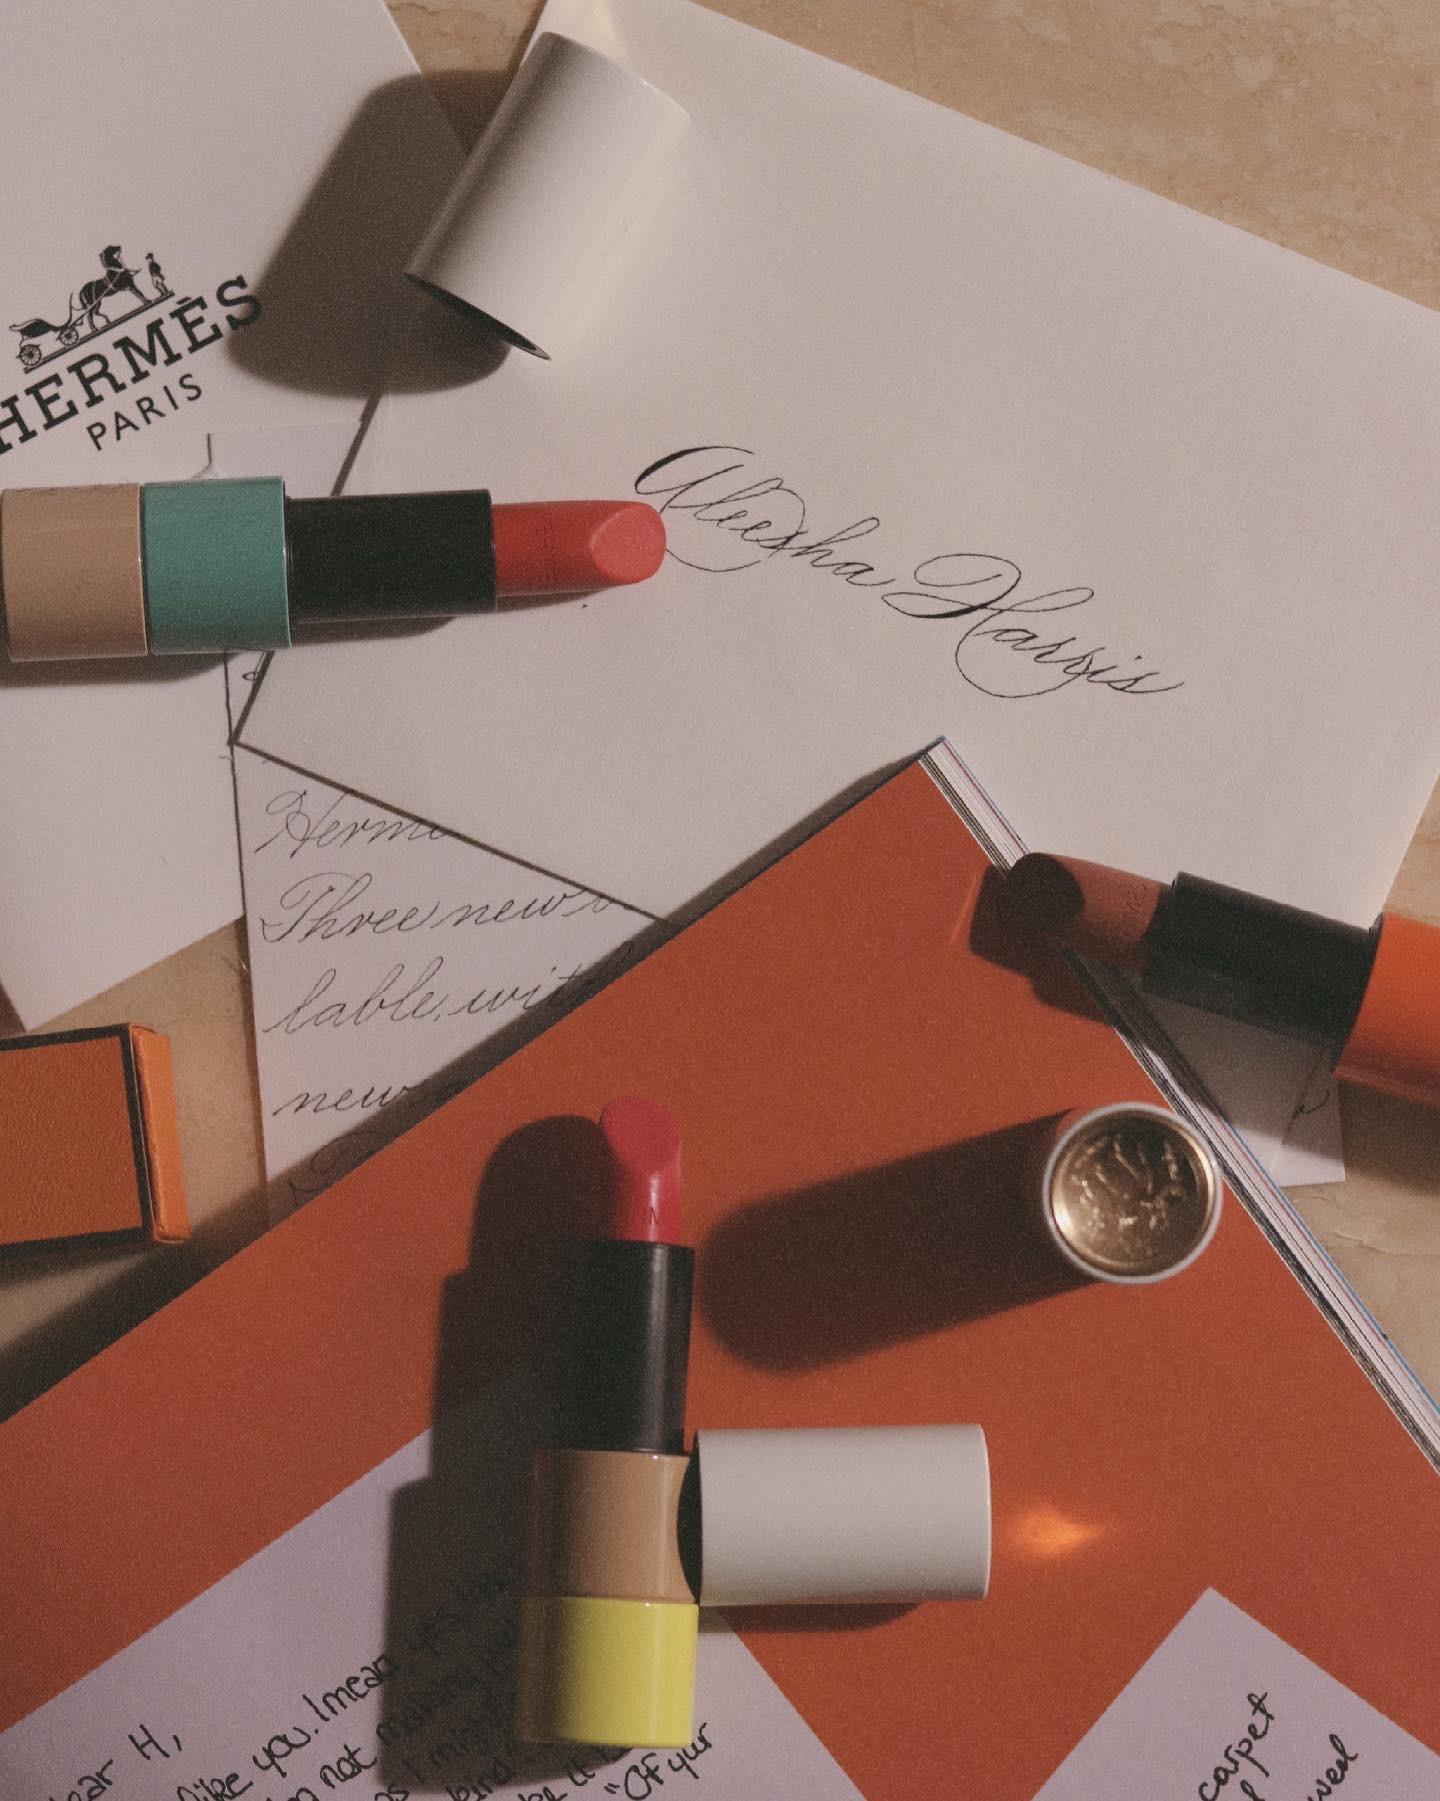 Rouge Hermès Spring 2021: A quick review